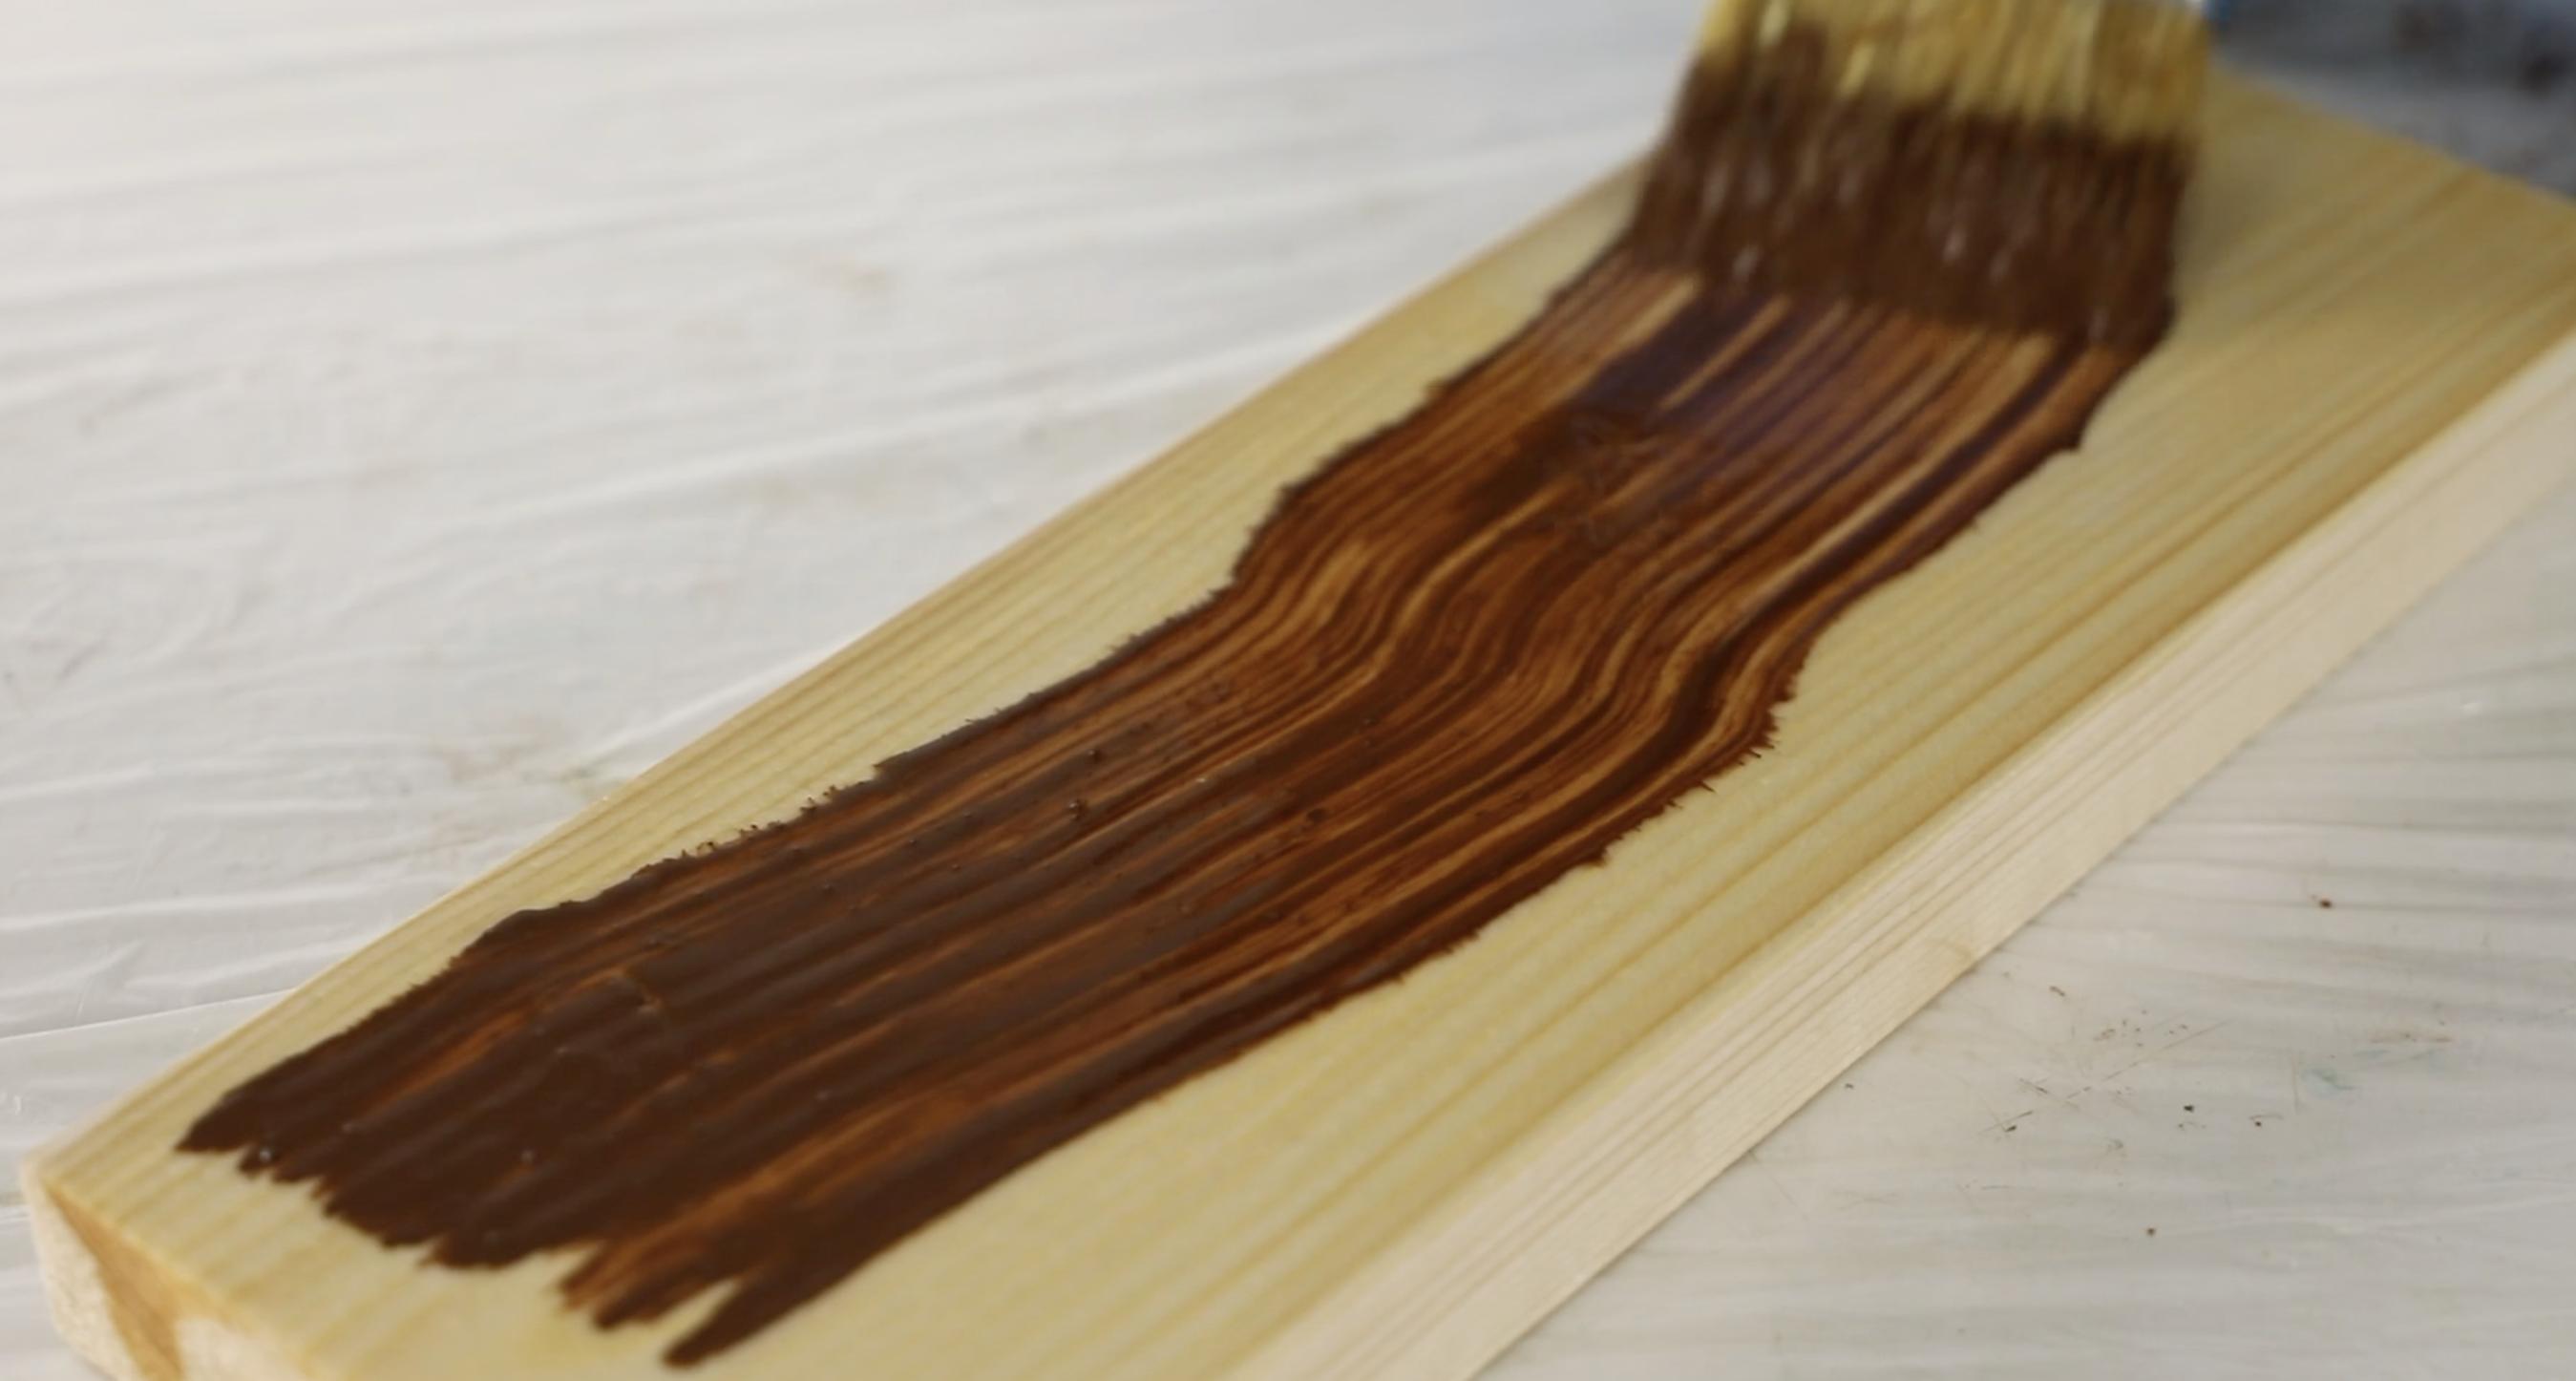 Applying wood stain